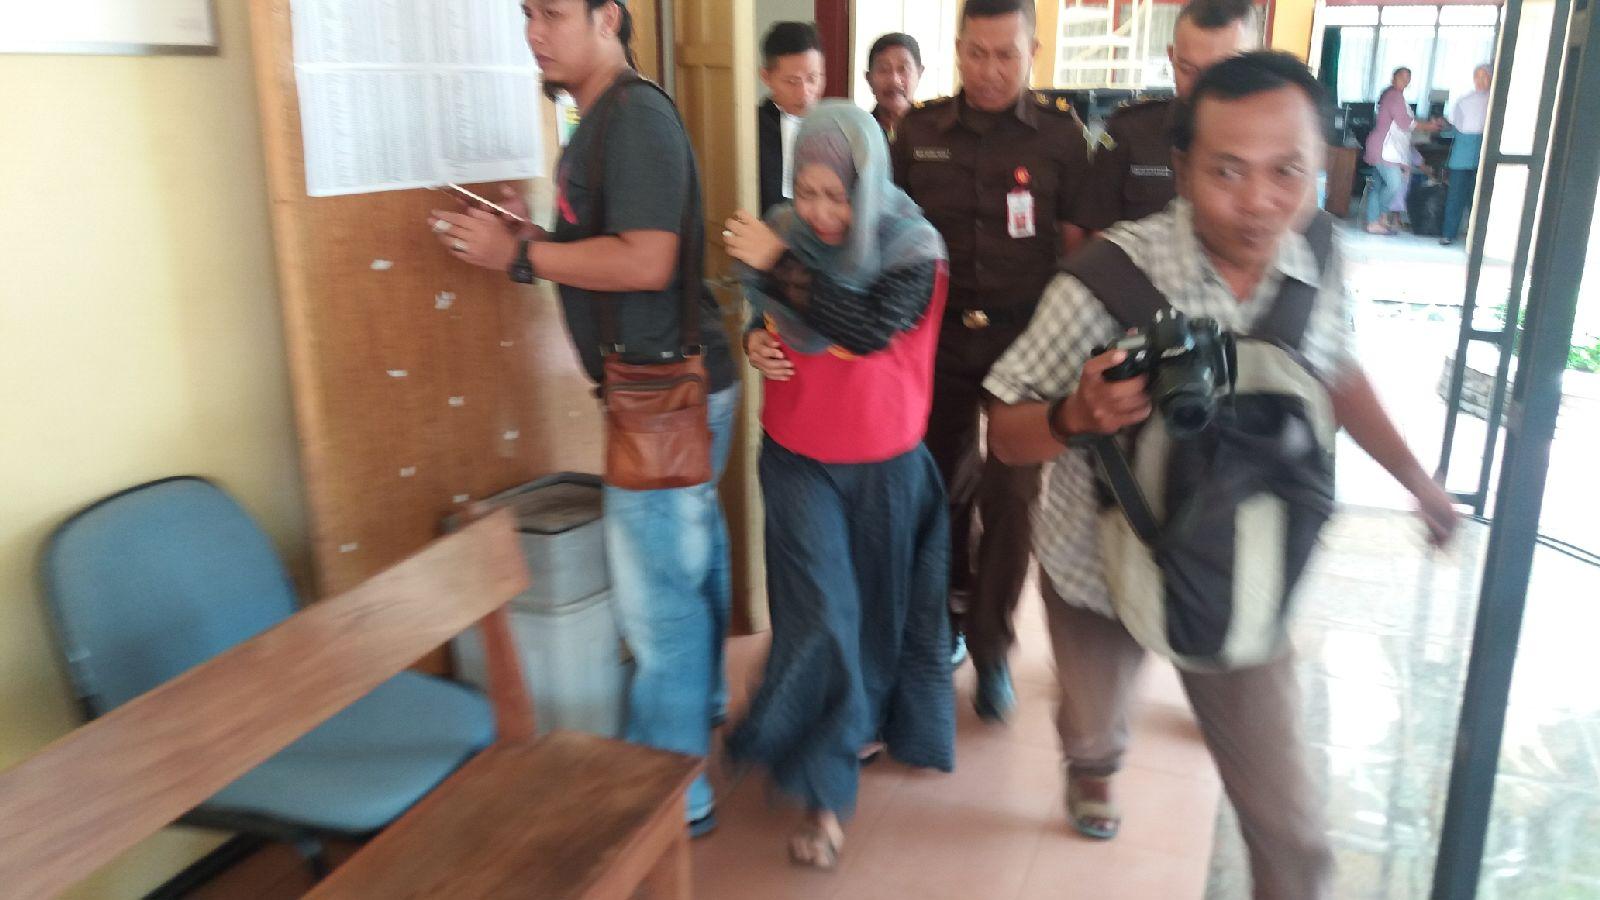 Heni Wildania (baju merah), warga Desa Trigonco, Kecamatan Asembagus, Situbondo, Jawa Timur, ibu tiri kejam terbukti membunuh anak tirinya Ainul Yakin. (fat)